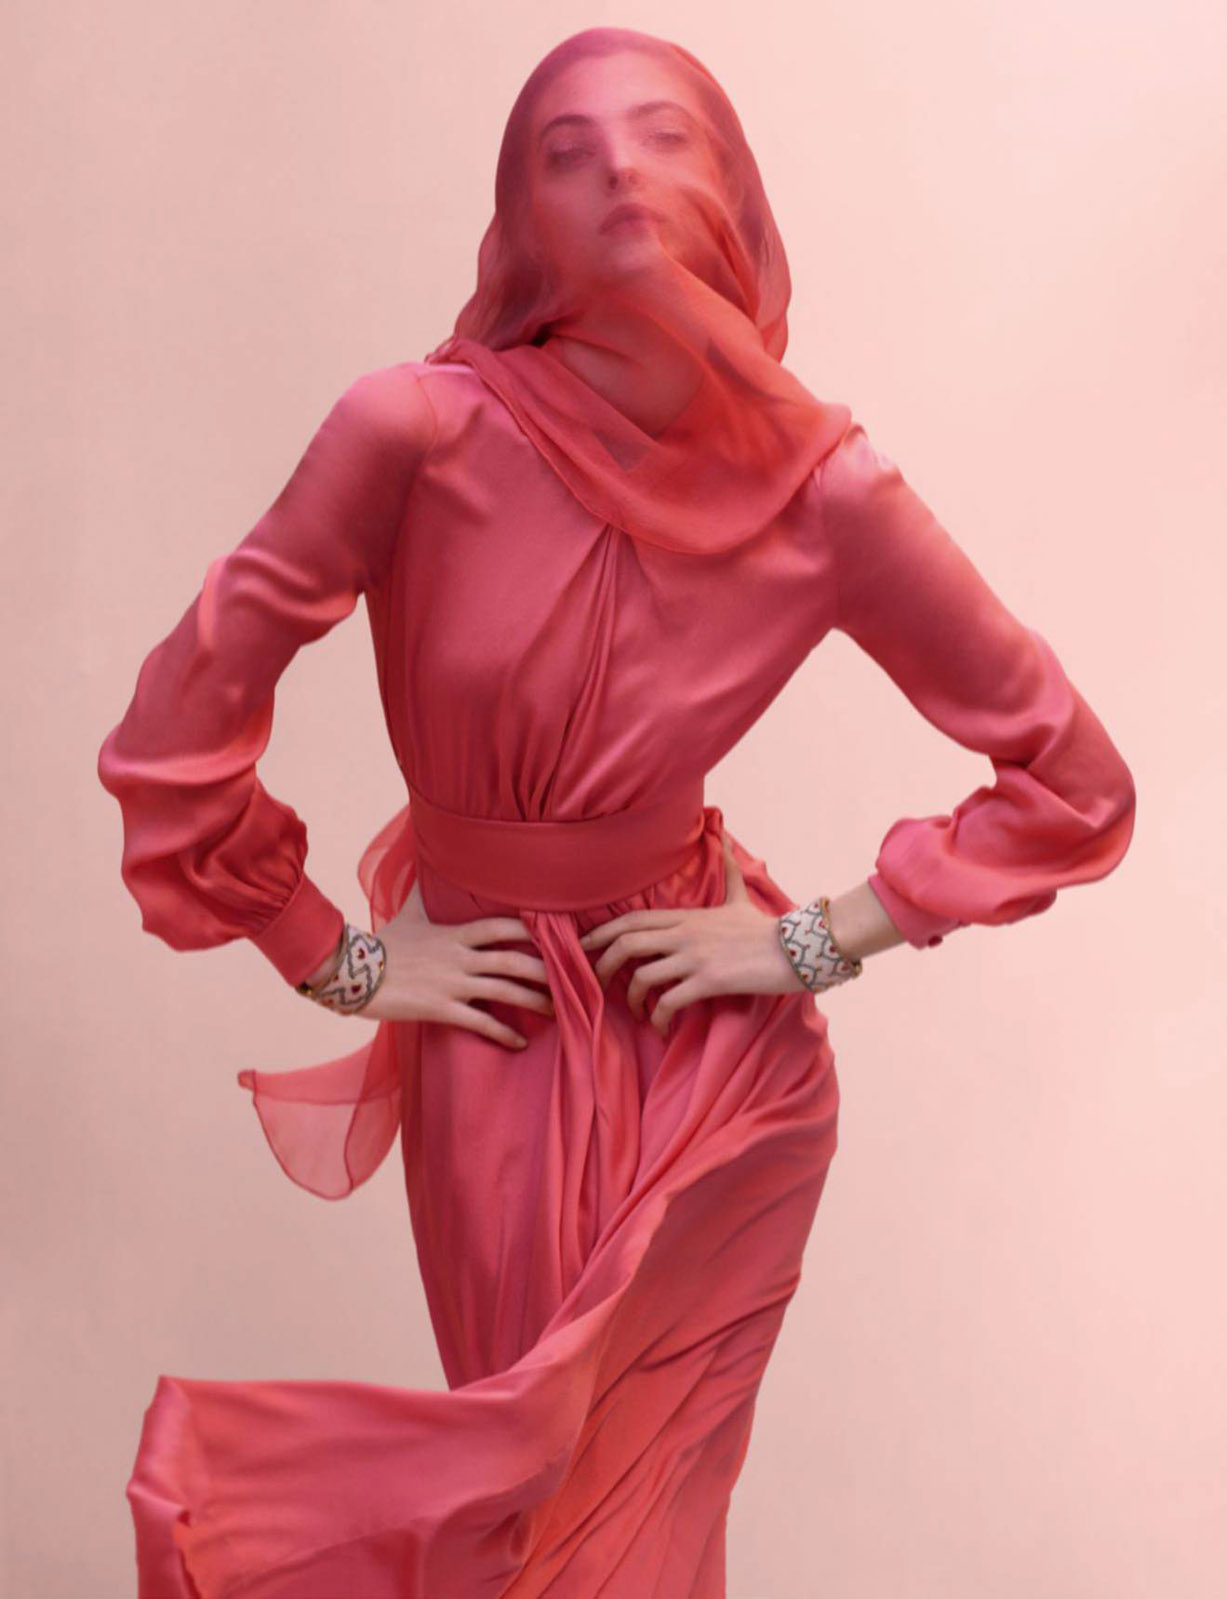 В Джайпуре с прицами - Виттория Черетти / Vittoria Ceretti by Mario Testino - Vogue Paris may 2017